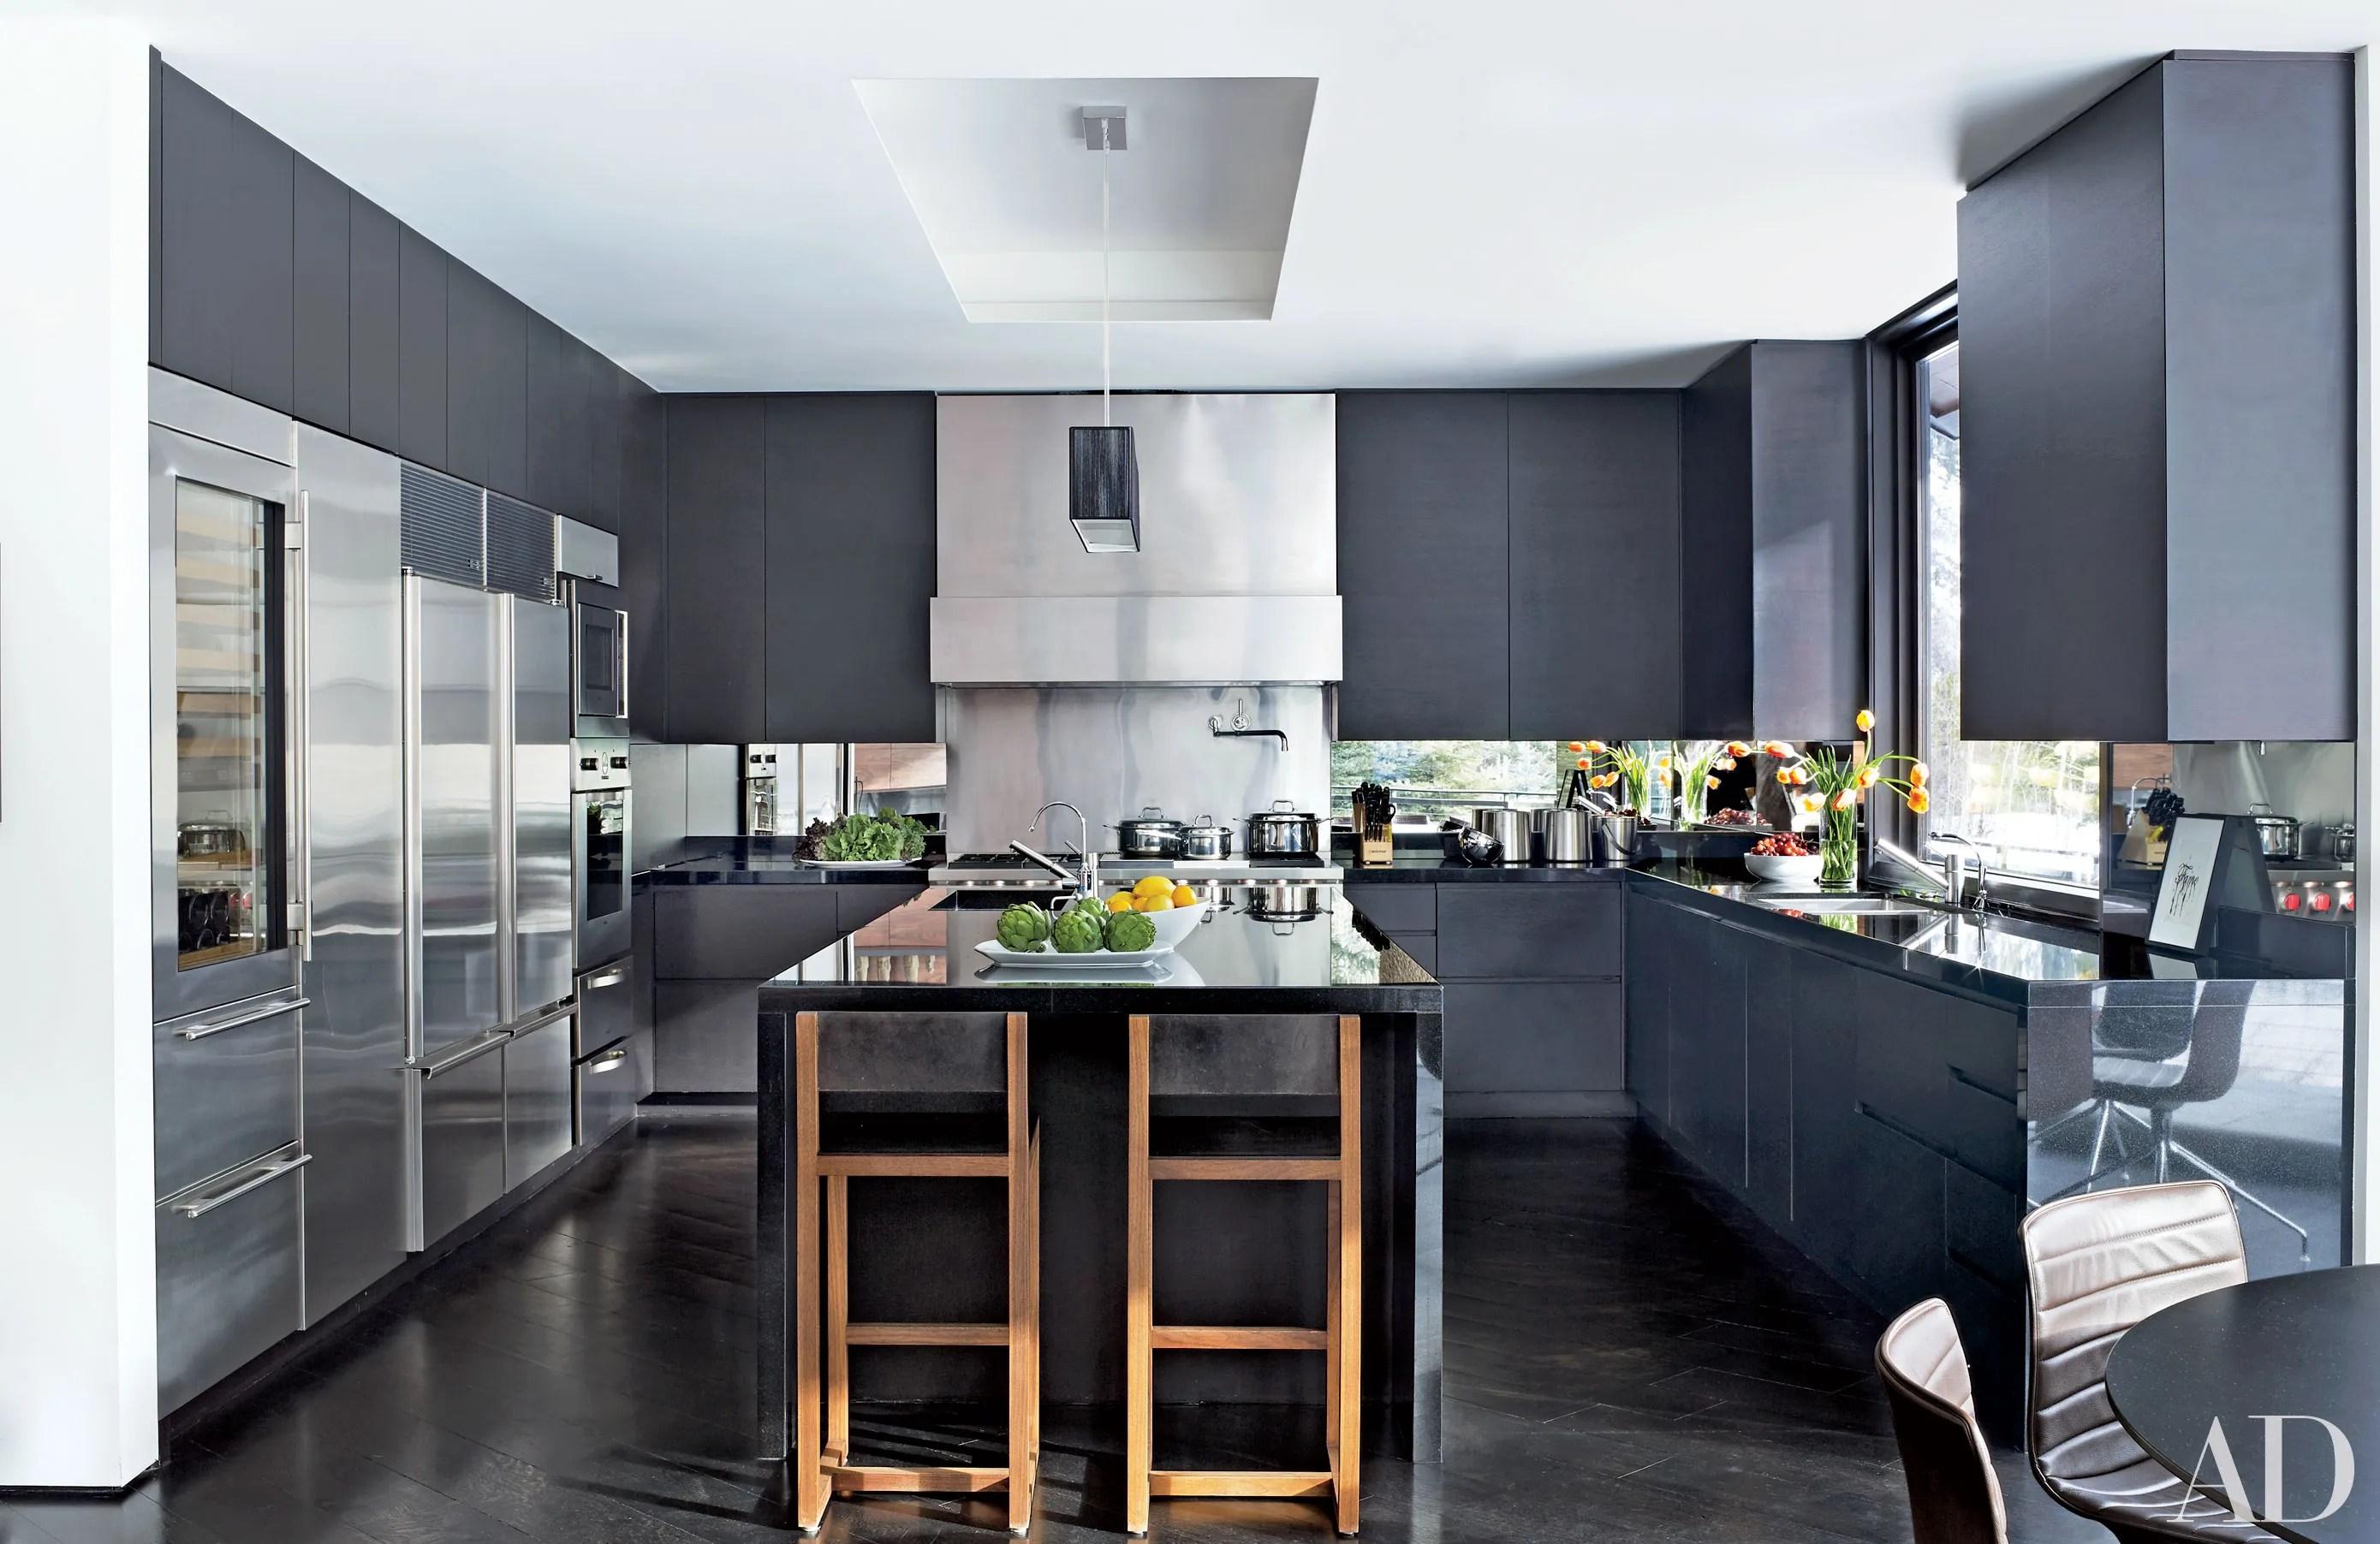 Fullsize Of Kitchen Remodel Photo Galleries